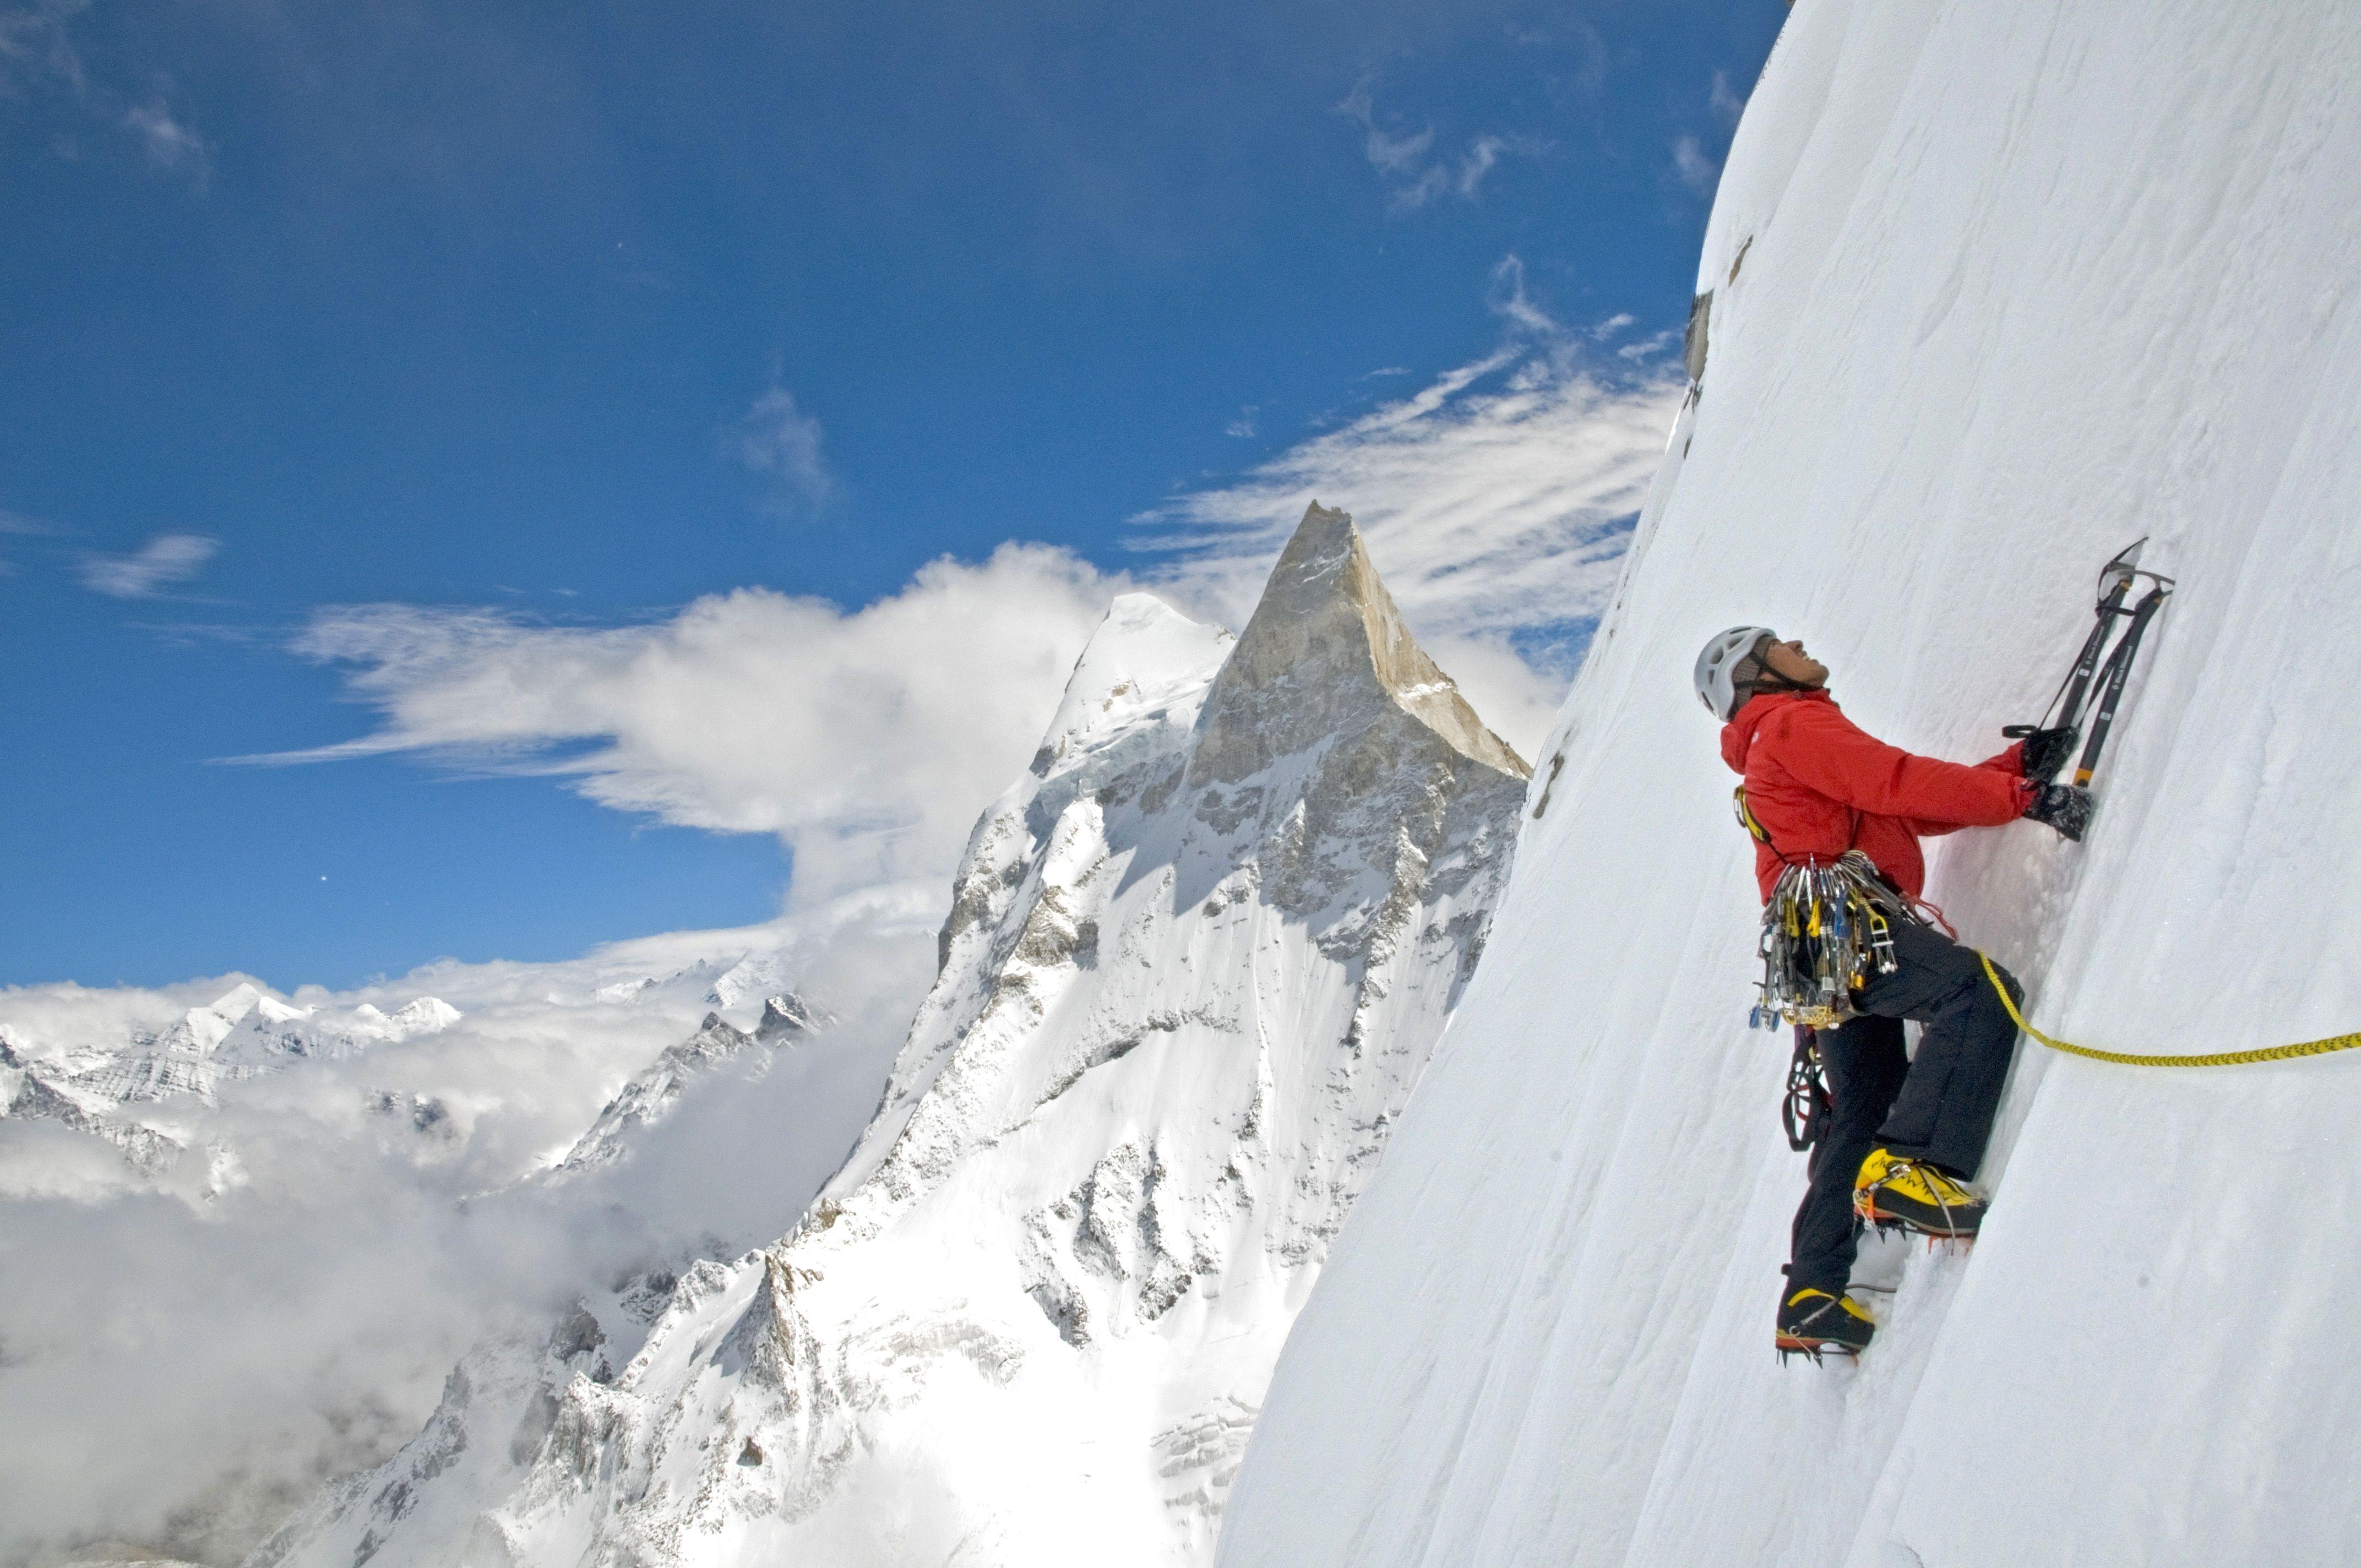 How Three Men Conquered Meru, the World's Most Perilous Climb